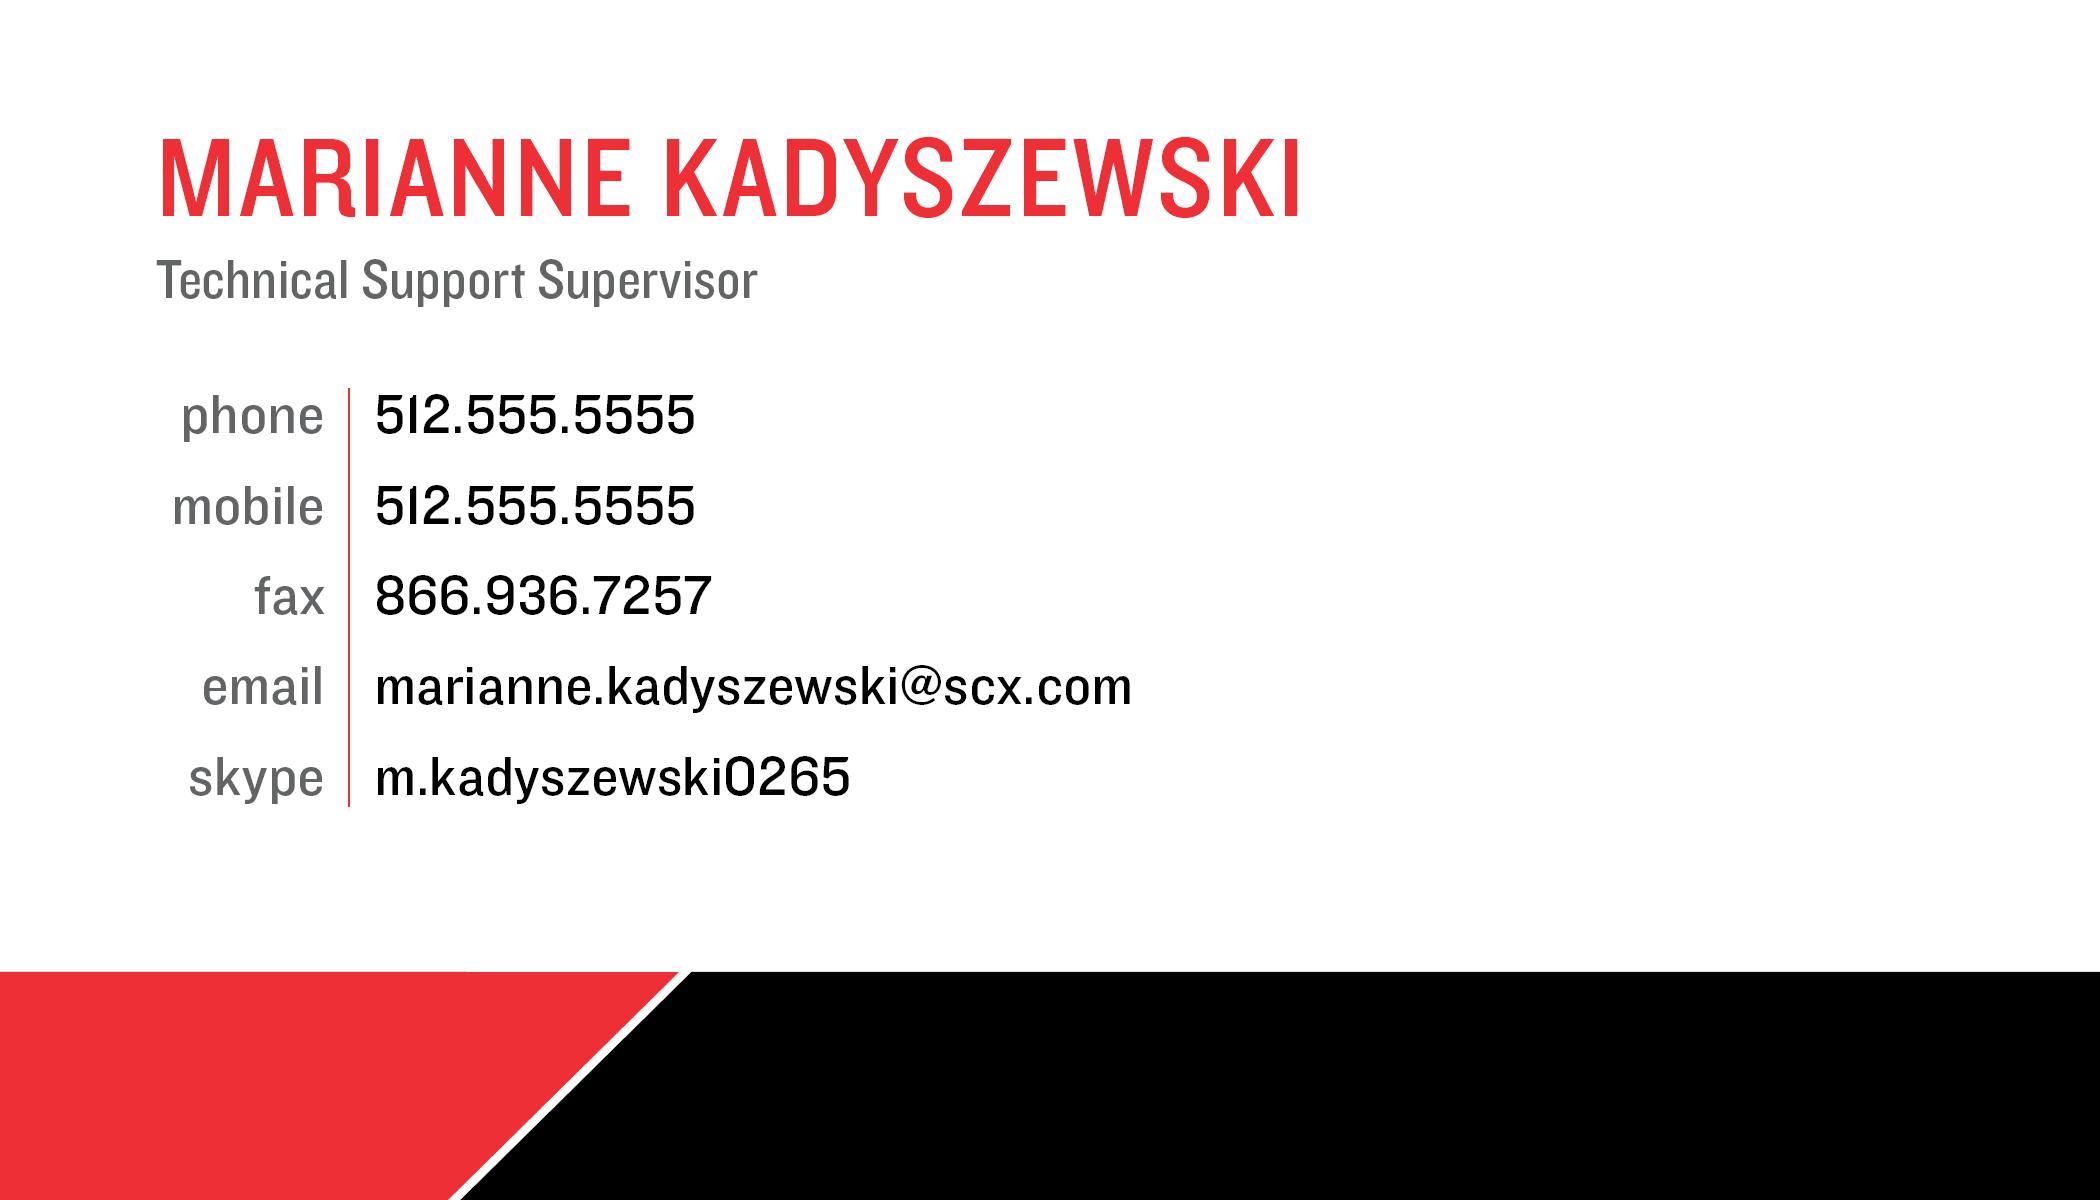 SC business card design concepts13.jpg